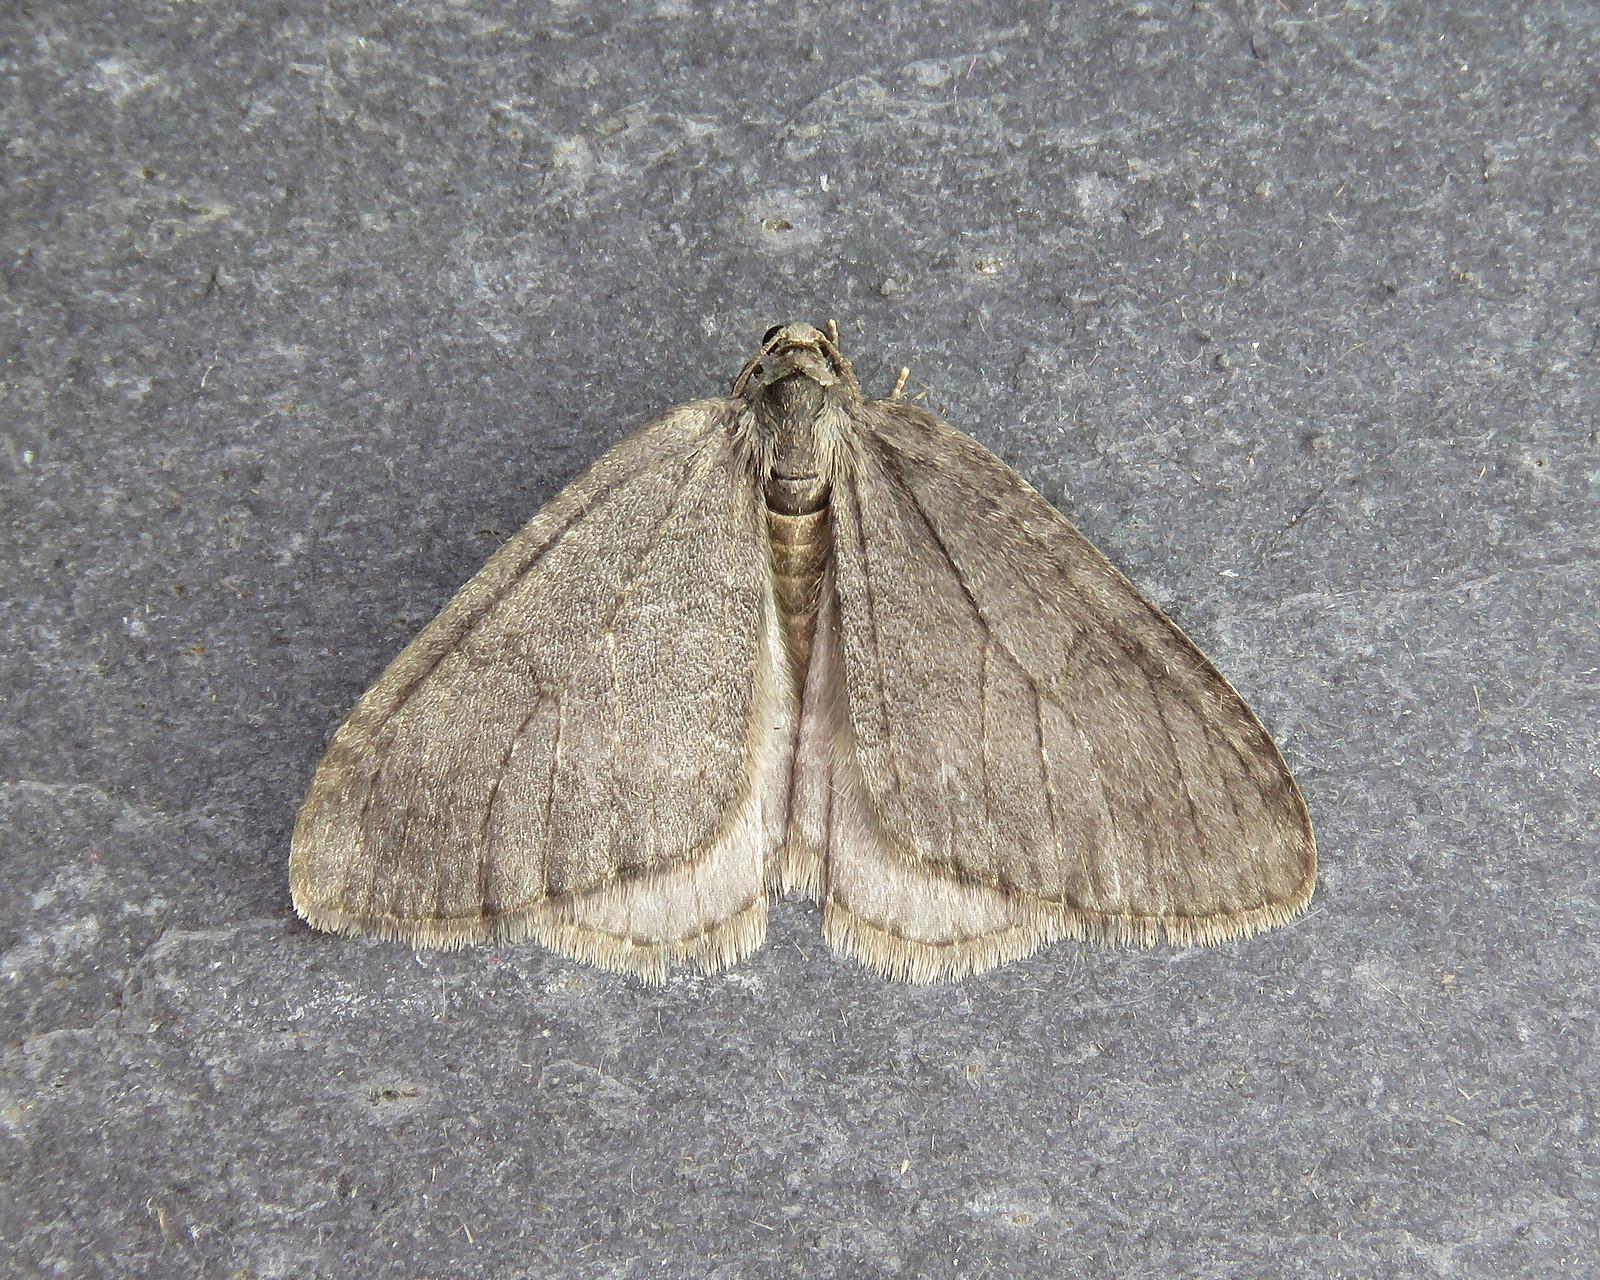 70.107 November Moth agg. - Epirrita dilutata agg.